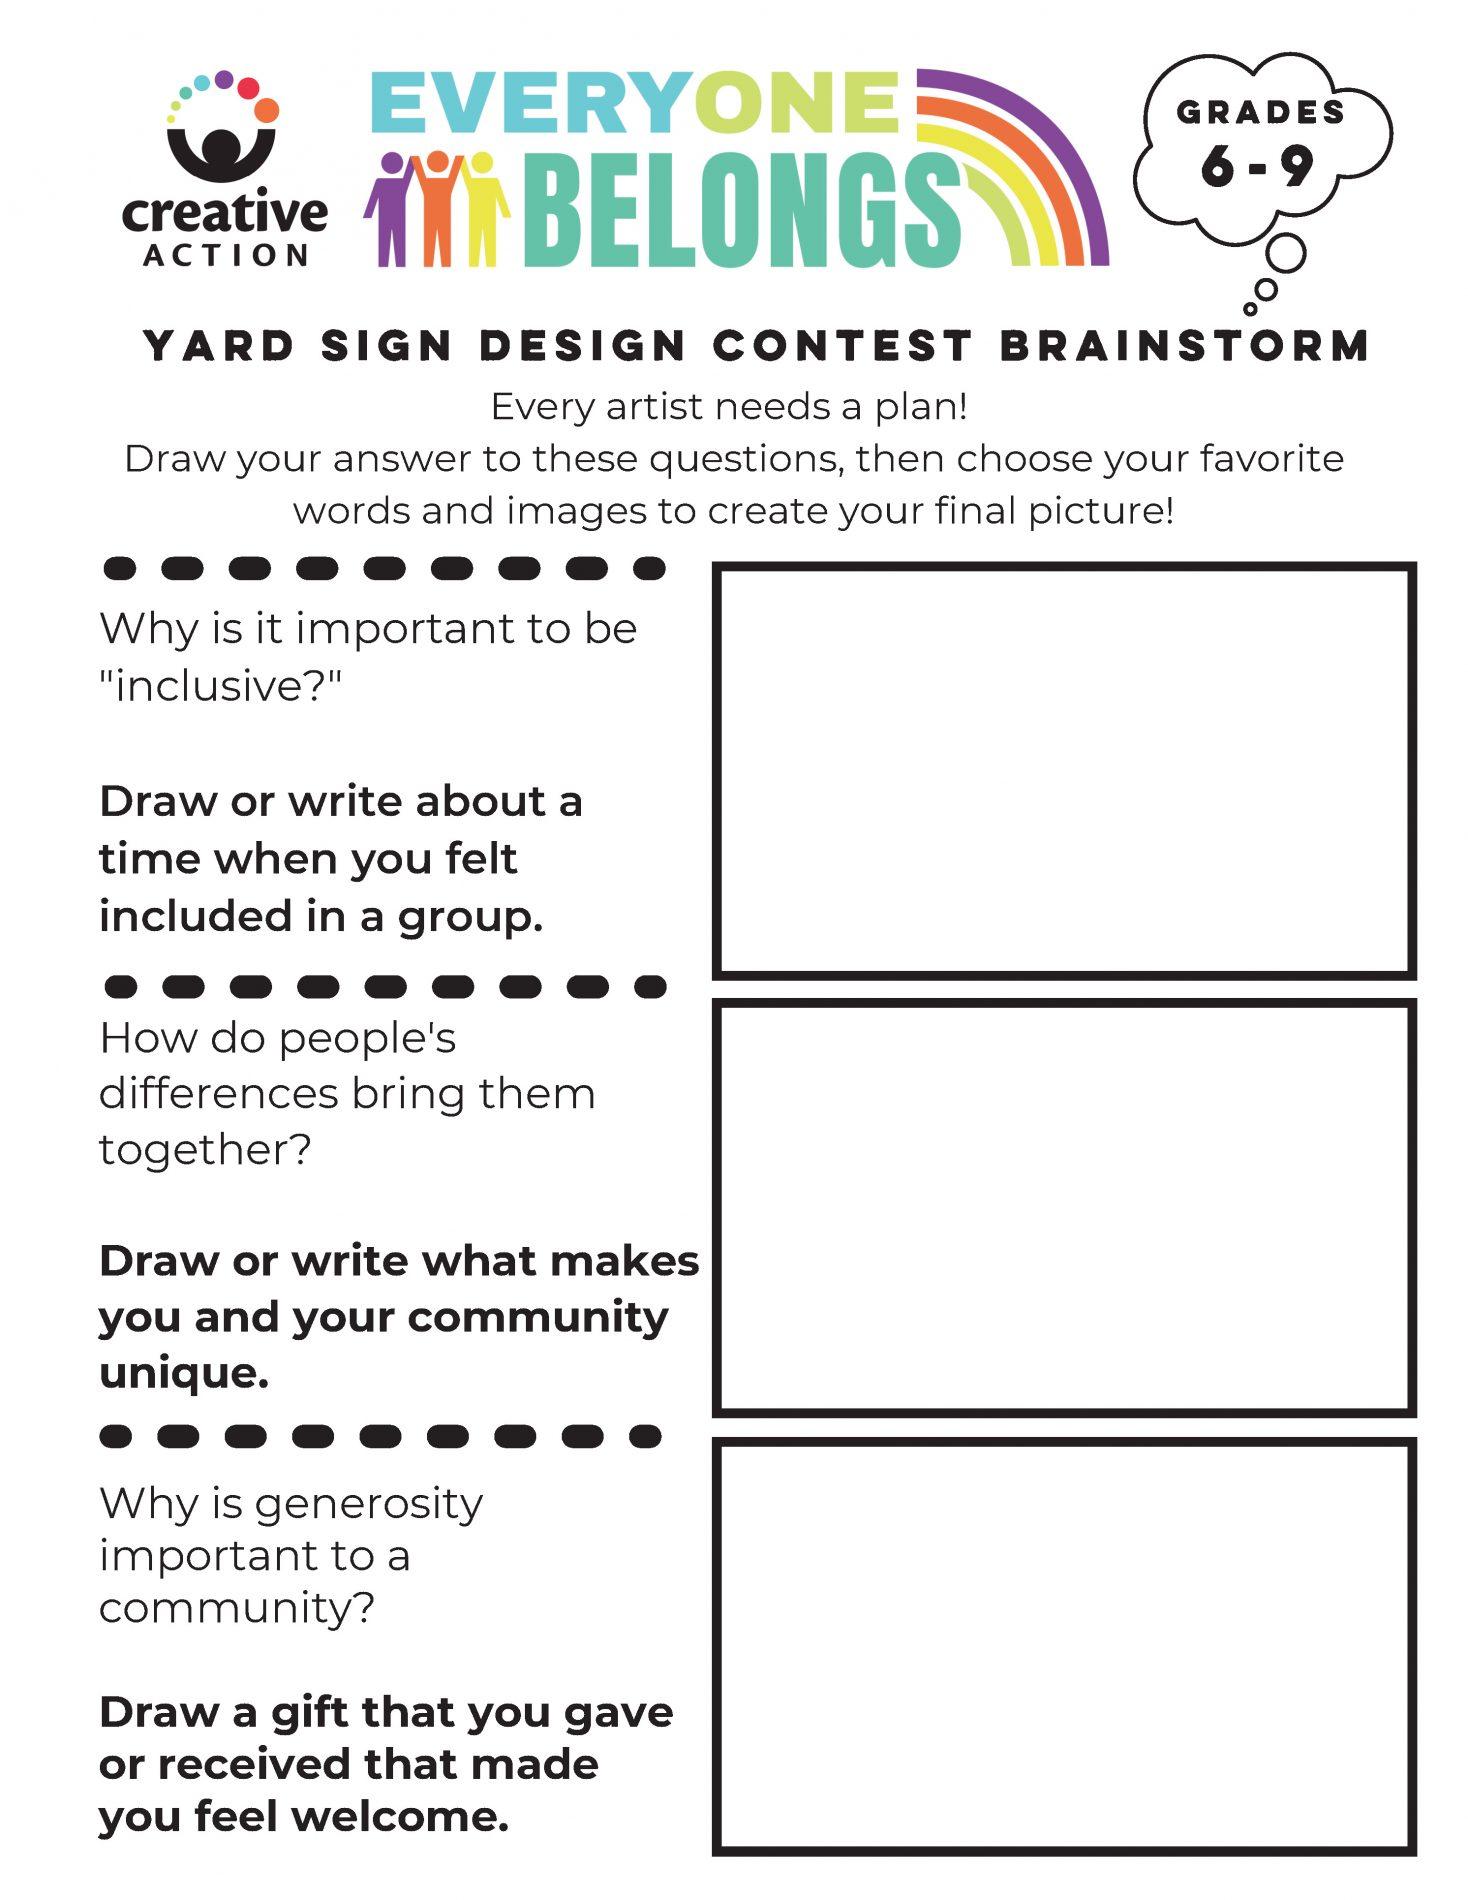 Brainstorm your yard sign design worksheet for 6th - 9th grades